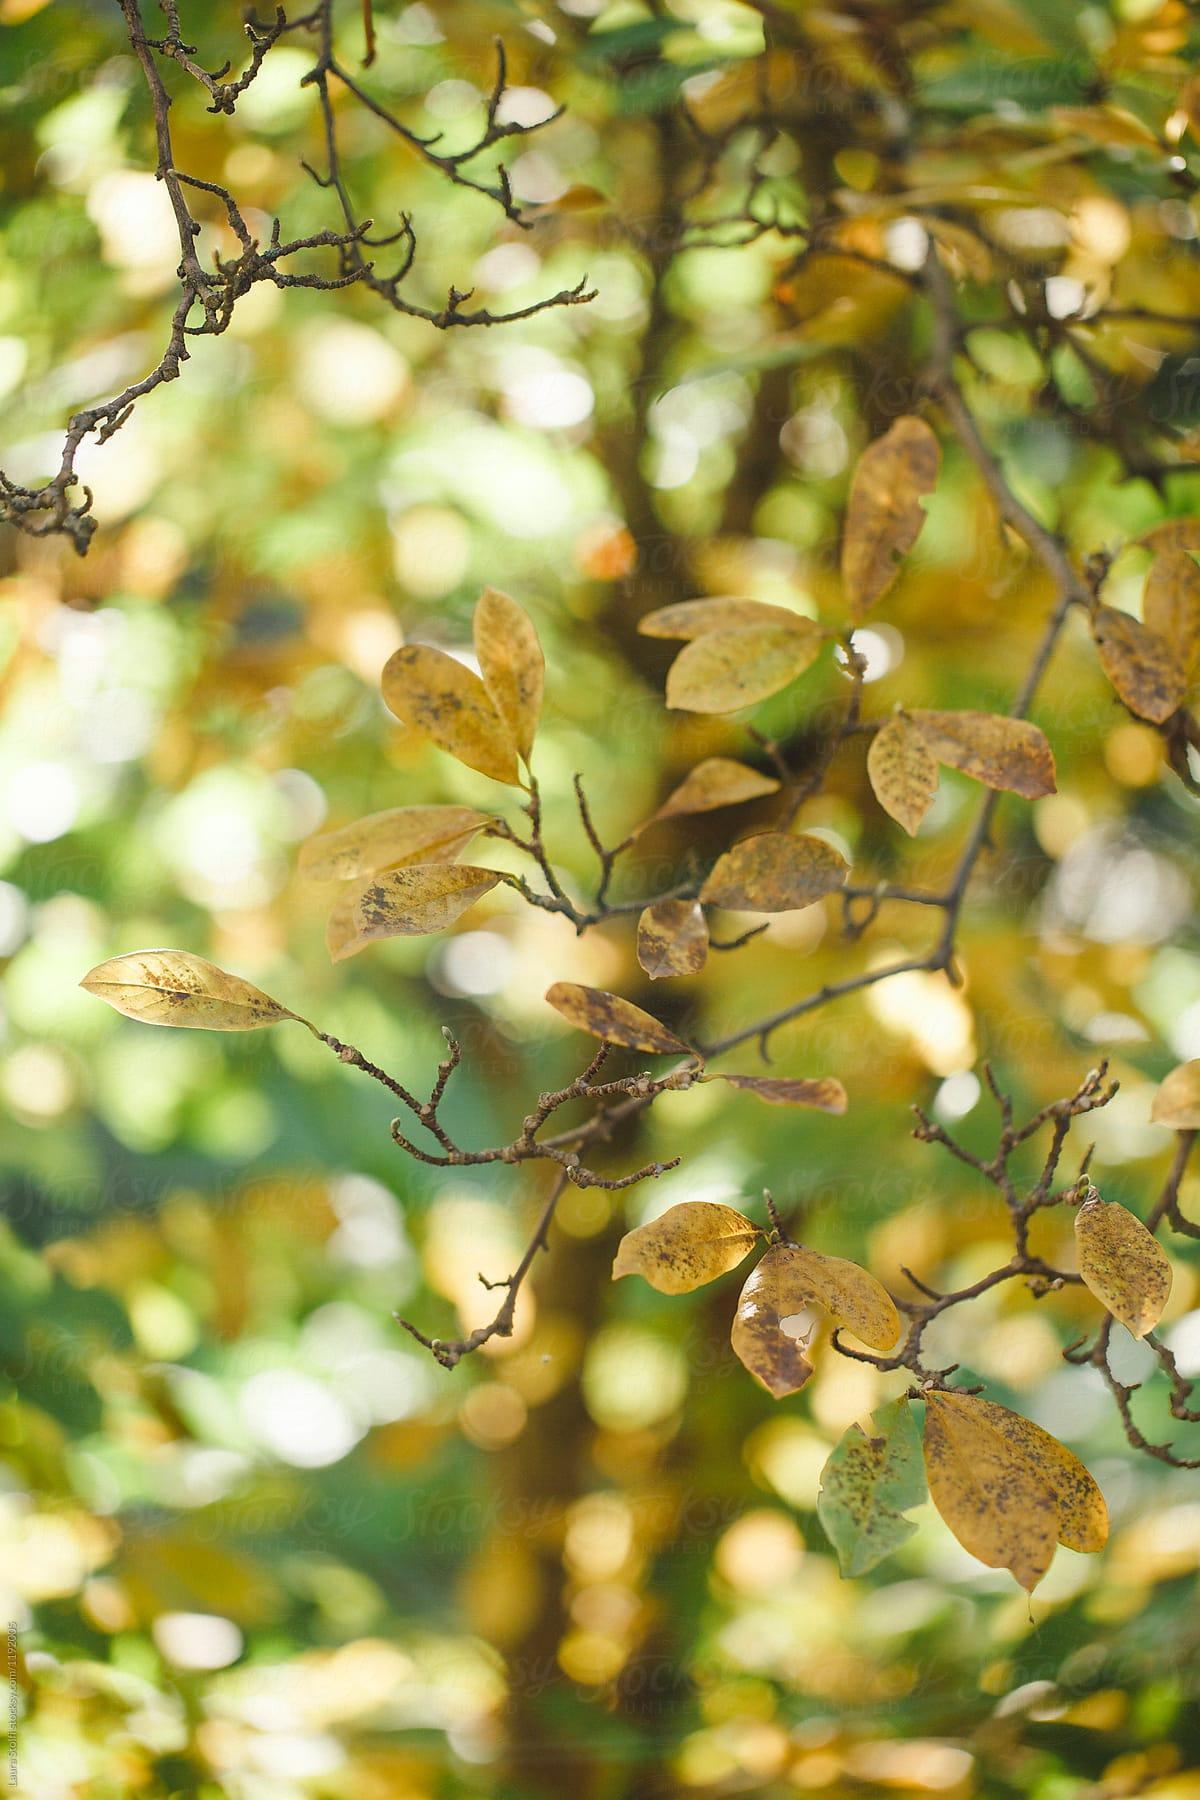 Leaves Changing Colors On Magnolia Tree Stocksy United